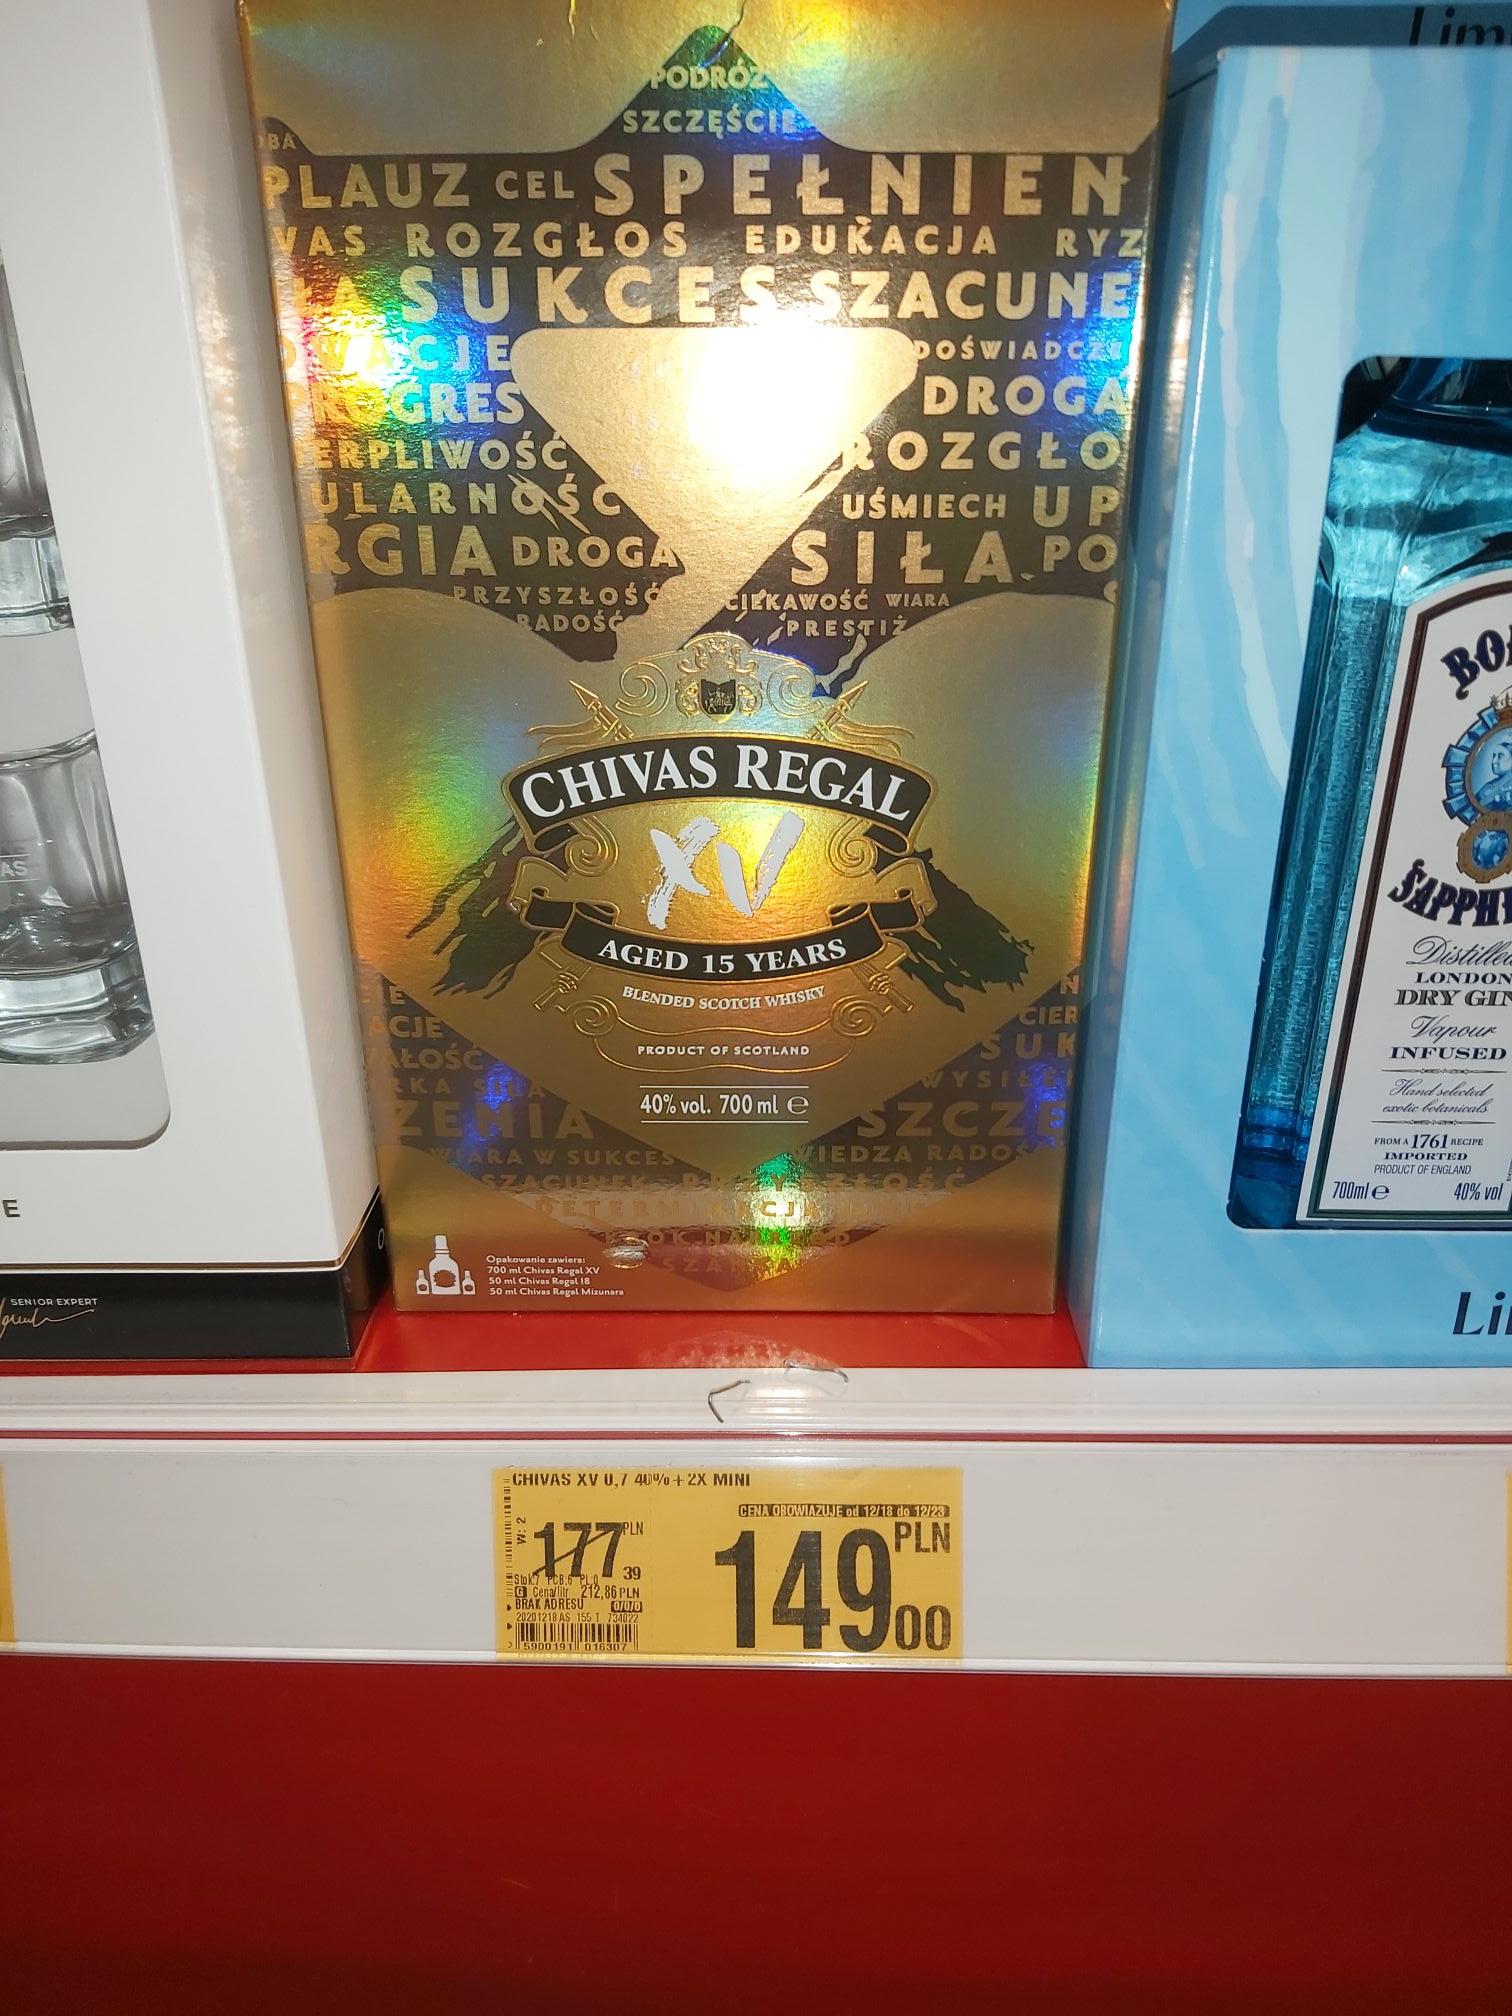 Chivas Regal XV whisky 700ml + 2x 50ml AUCHAN